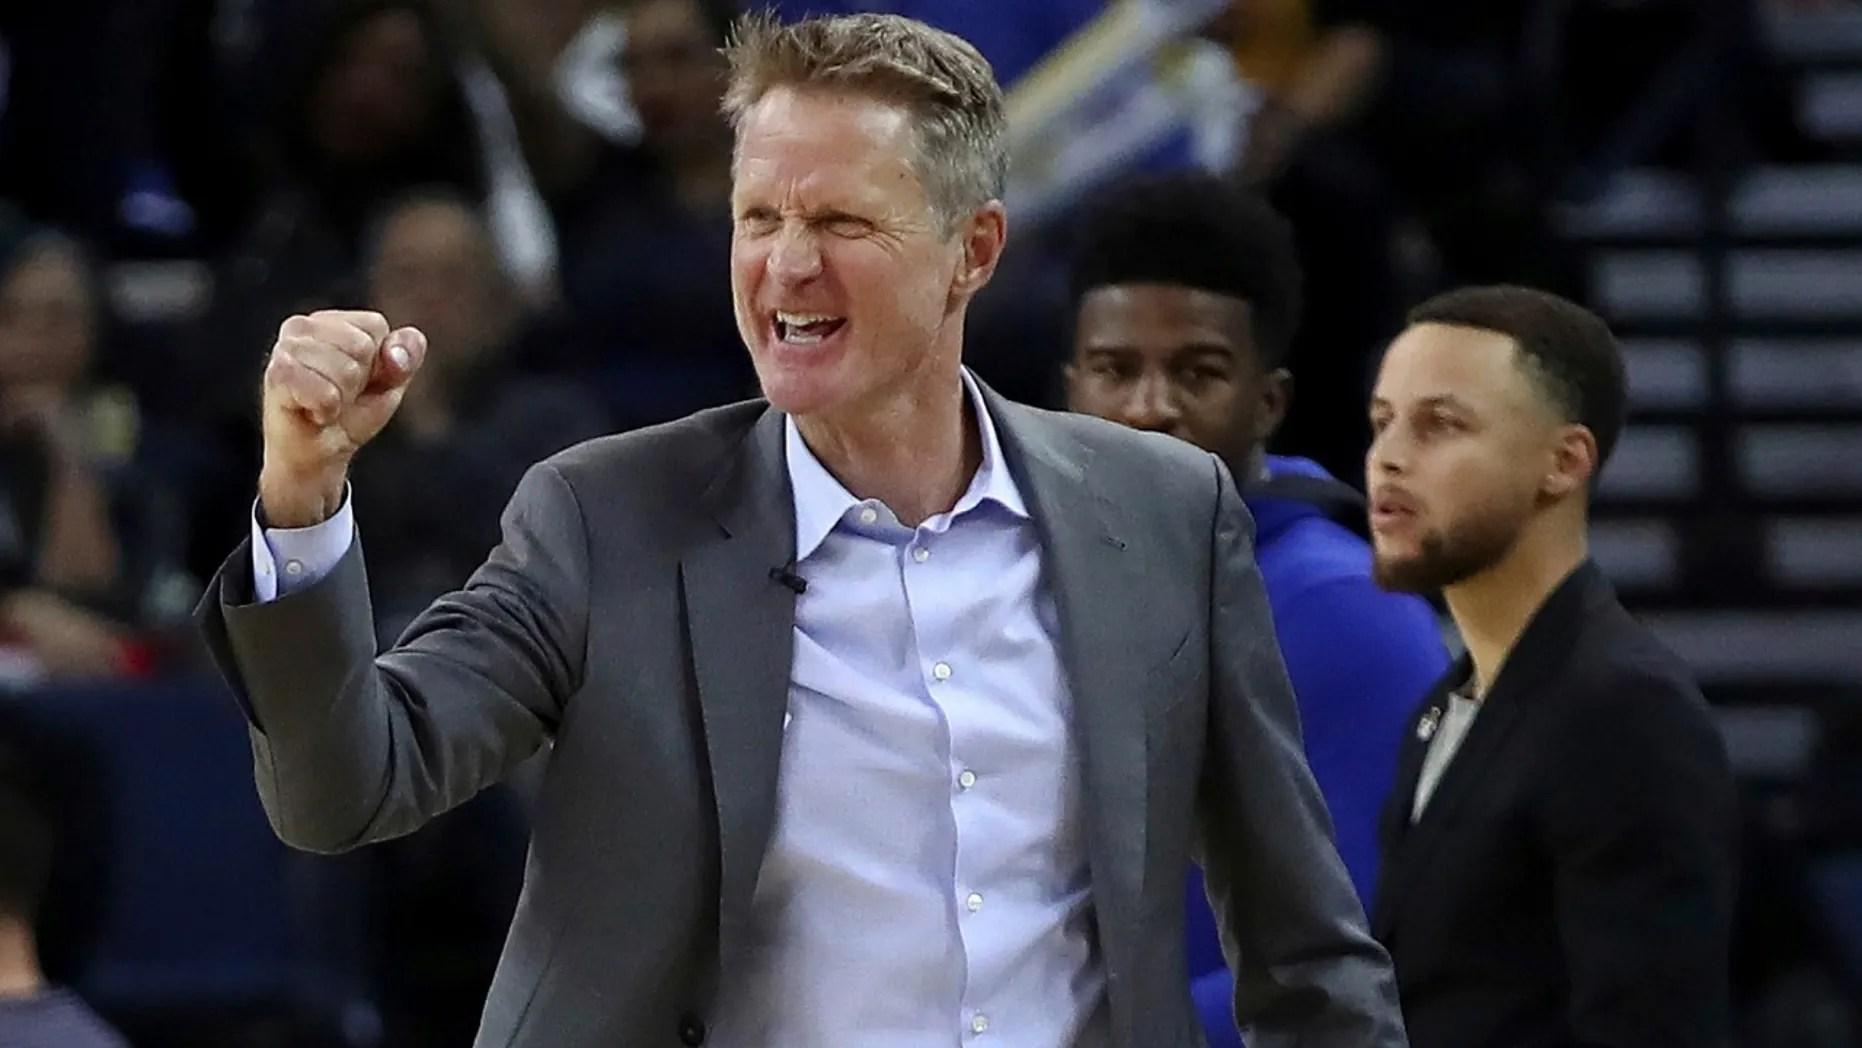 Golden State Warriors head coachSteve Kerr said he has mixed feelings on military displays before NBA games.